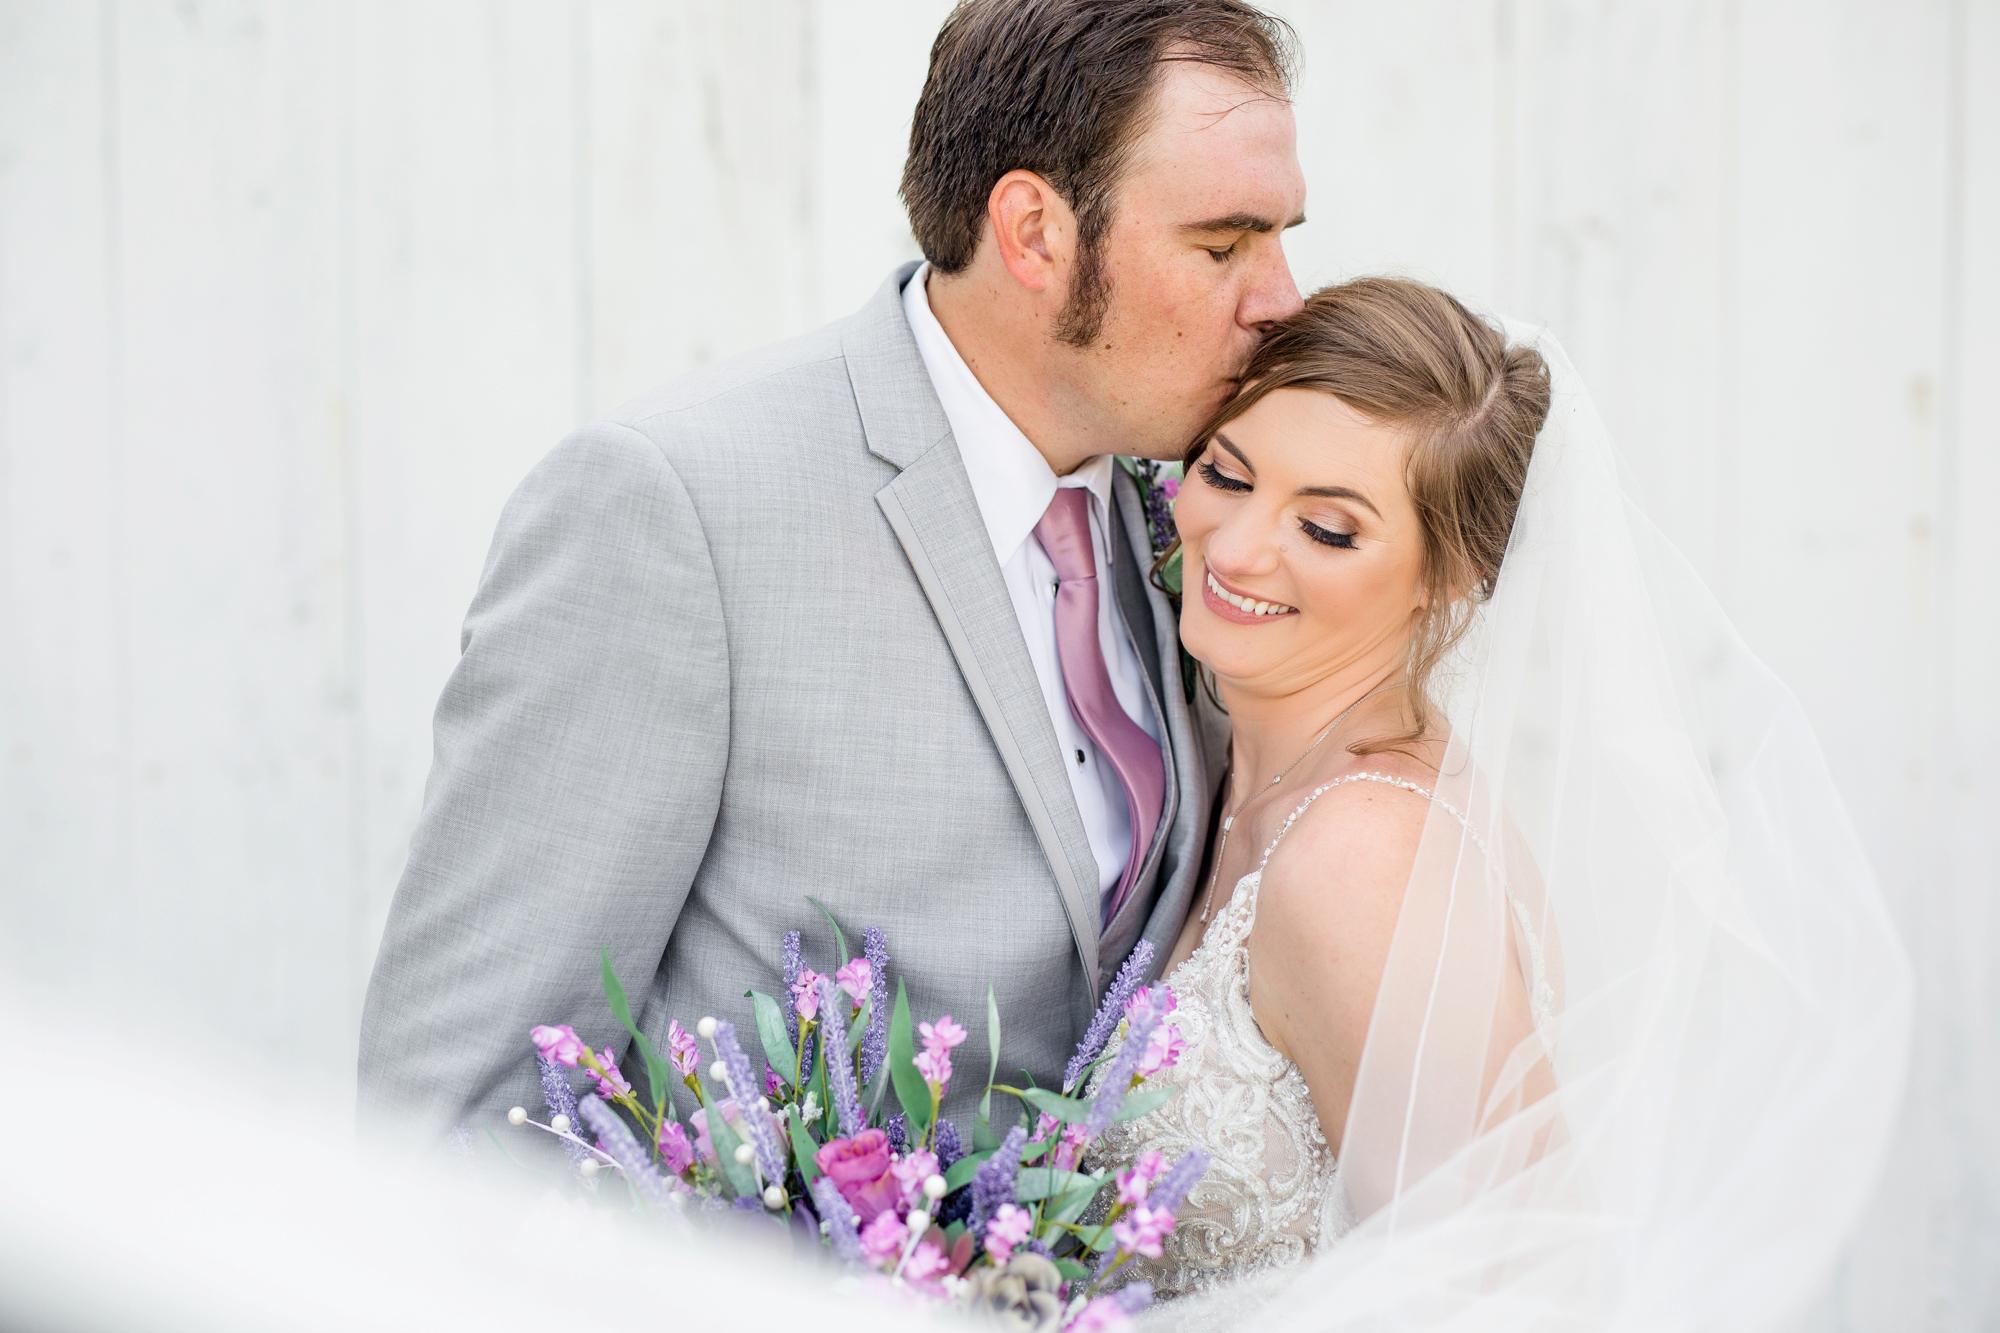 pittsburgh wedding photographer, pittsburgh wedding venues, pittsburgh wedding photos, renshaw family farms wedding photos